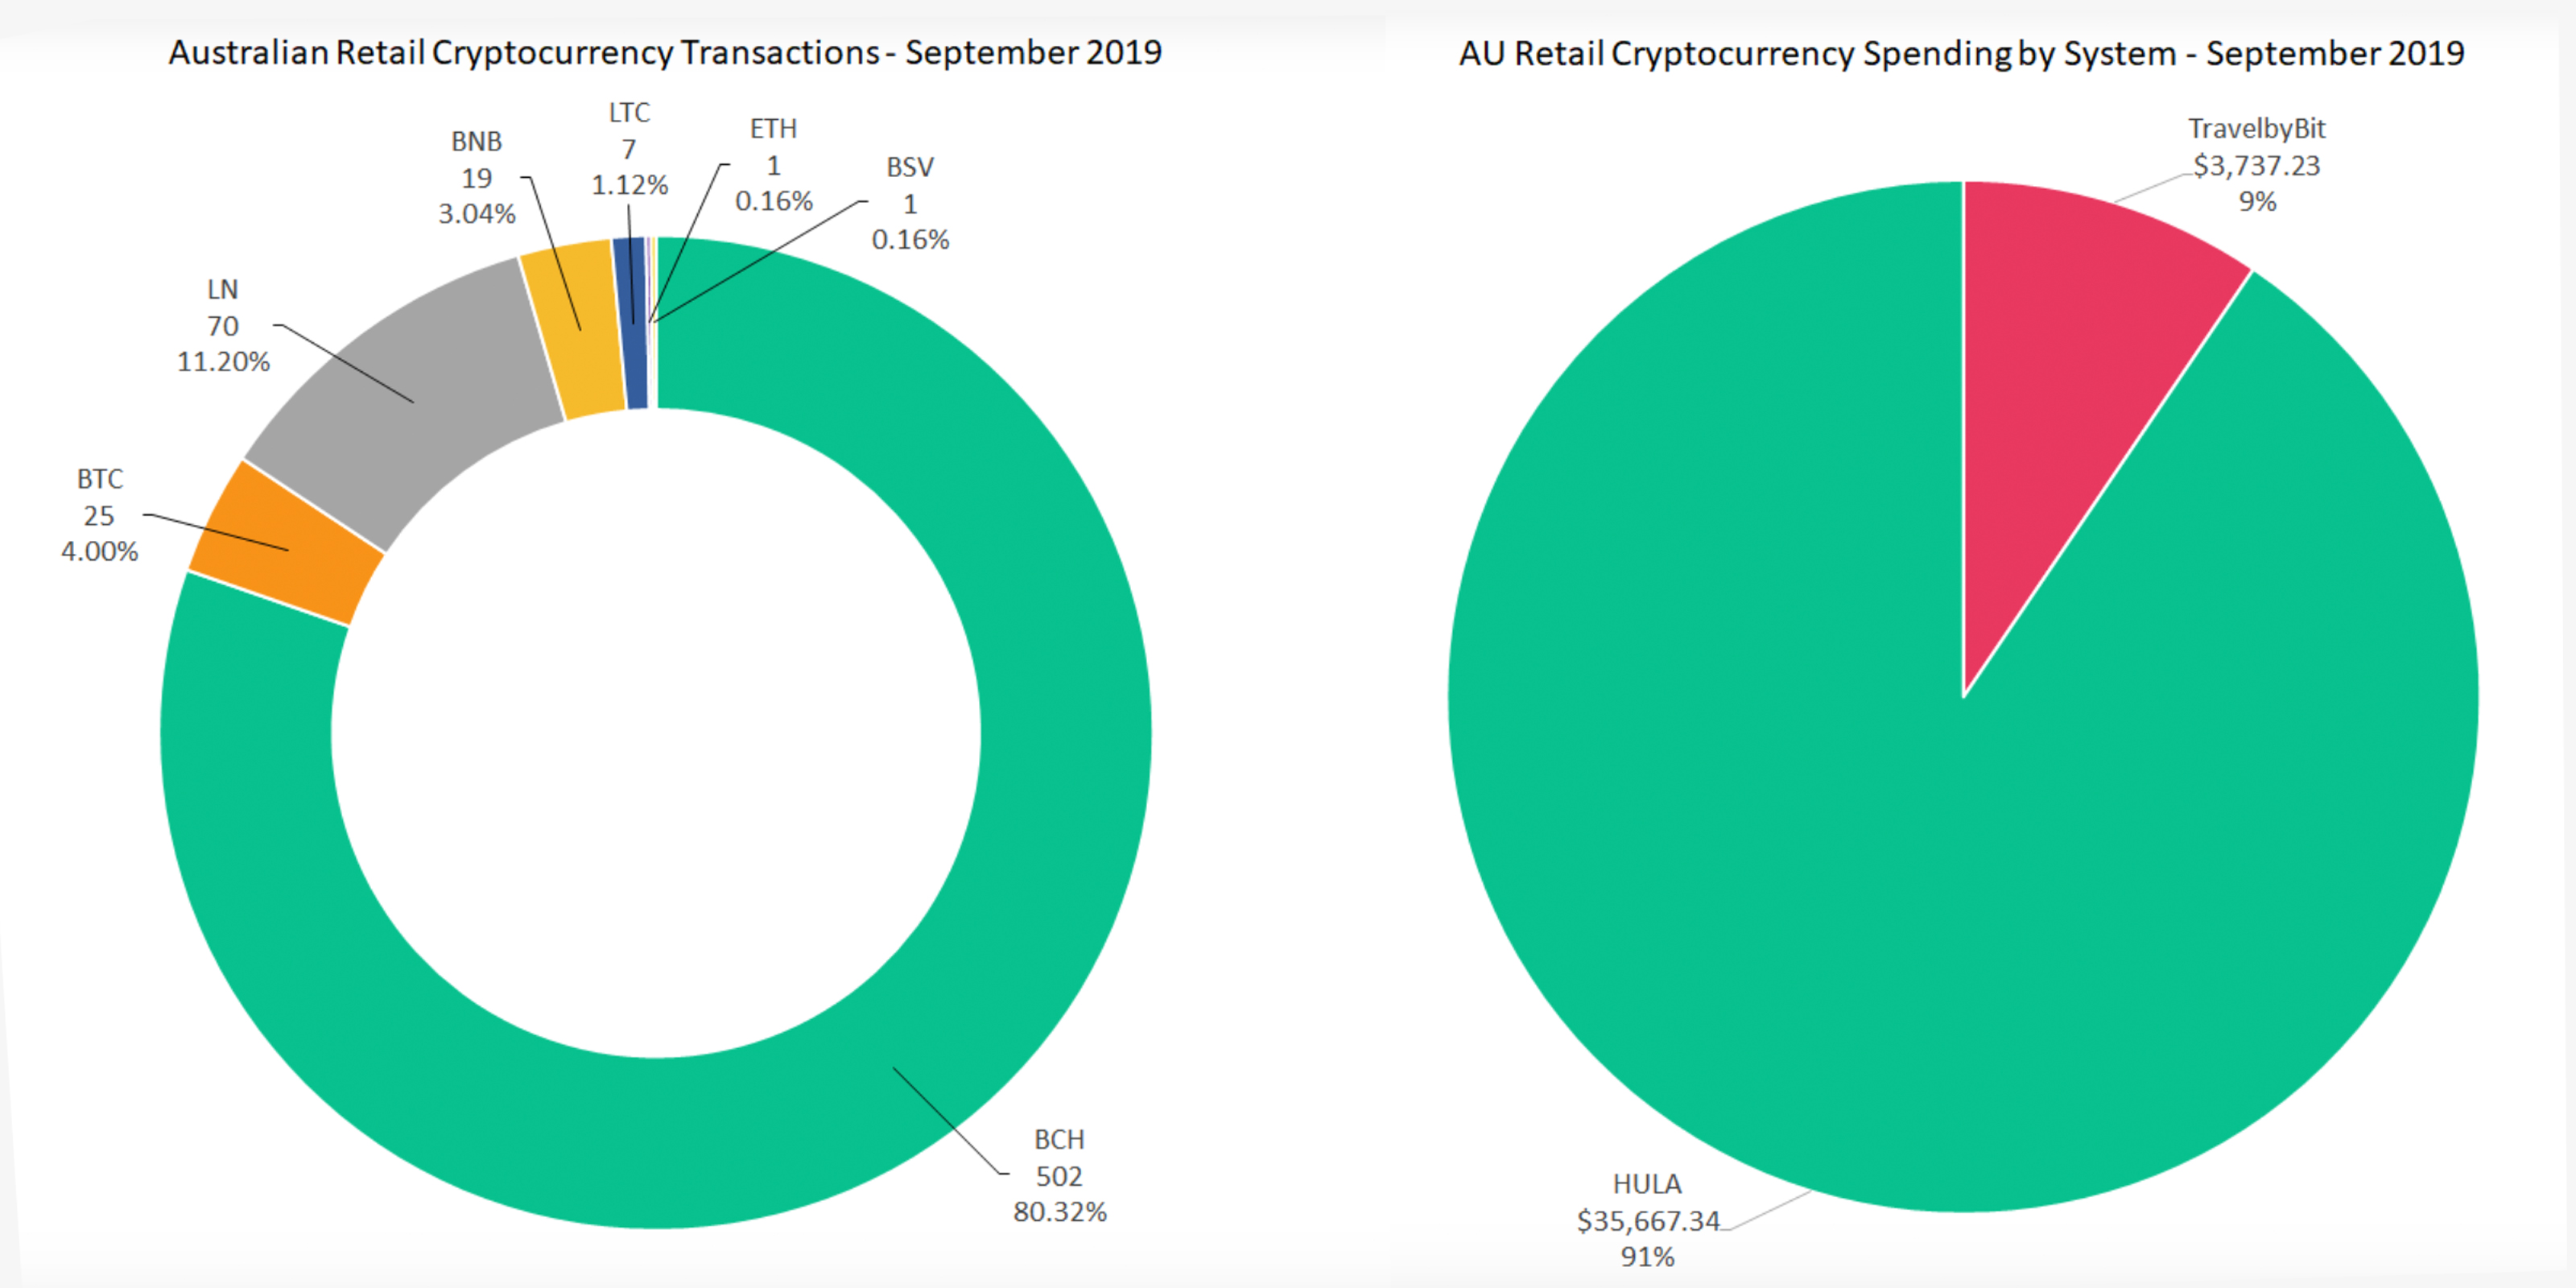 "Bitcoin Cash eclipsa el gasto minorista de BTC en Australia por un amplio margen ""width ="" 3200 ""height ="" 1600 ""srcset ="" https://blackswanfinances.com/wp-content/uploads/2019/10/charts6666.jpg 3200w , https://news.bitcoin.com/wp-content/uploads/2019/10/charts6666-300x150.jpg 300w, https://news.bitcoin.com/wp-content/uploads/2019/10/charts6666- 768x384.jpg 768w, https://news.bitcoin.com/wp-content/uploads/2019/10/charts6666-1024x512.jpg 1024w, https://news.bitcoin.com/wp-content/uploads/2019/ 10 / charts6666-696x348.jpg 696w, https://news.bitcoin.com/wp-content/uploads/2019/10/charts6666-1392x696.jpg 1392w, https://news.bitcoin.com/wp-content/ uploads / 2019/10 / charts6666-1068x534.jpg 1068w, https://news.bitcoin.com/wp-content/uploads/2019/10/charts6666-840x420.jpg 840w ""tamaños ="" (ancho máximo : 3200px) 100vw, 3200px"